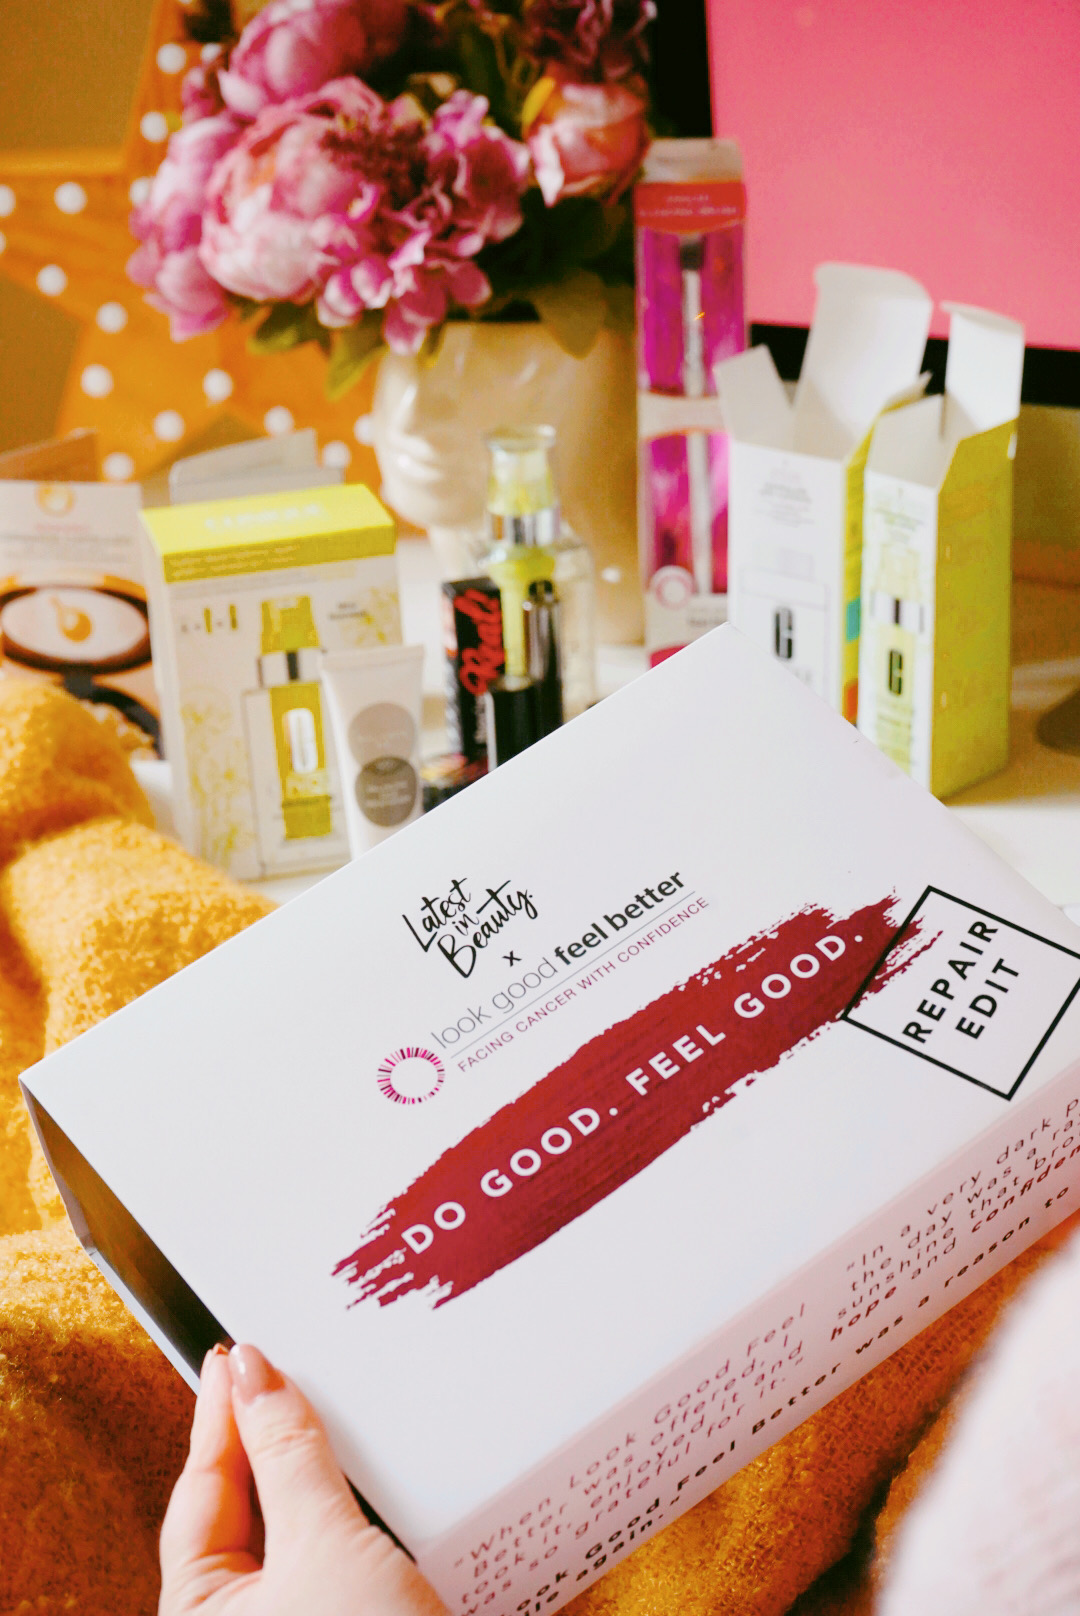 Latest In Beauty - Do Good Feel Good Box